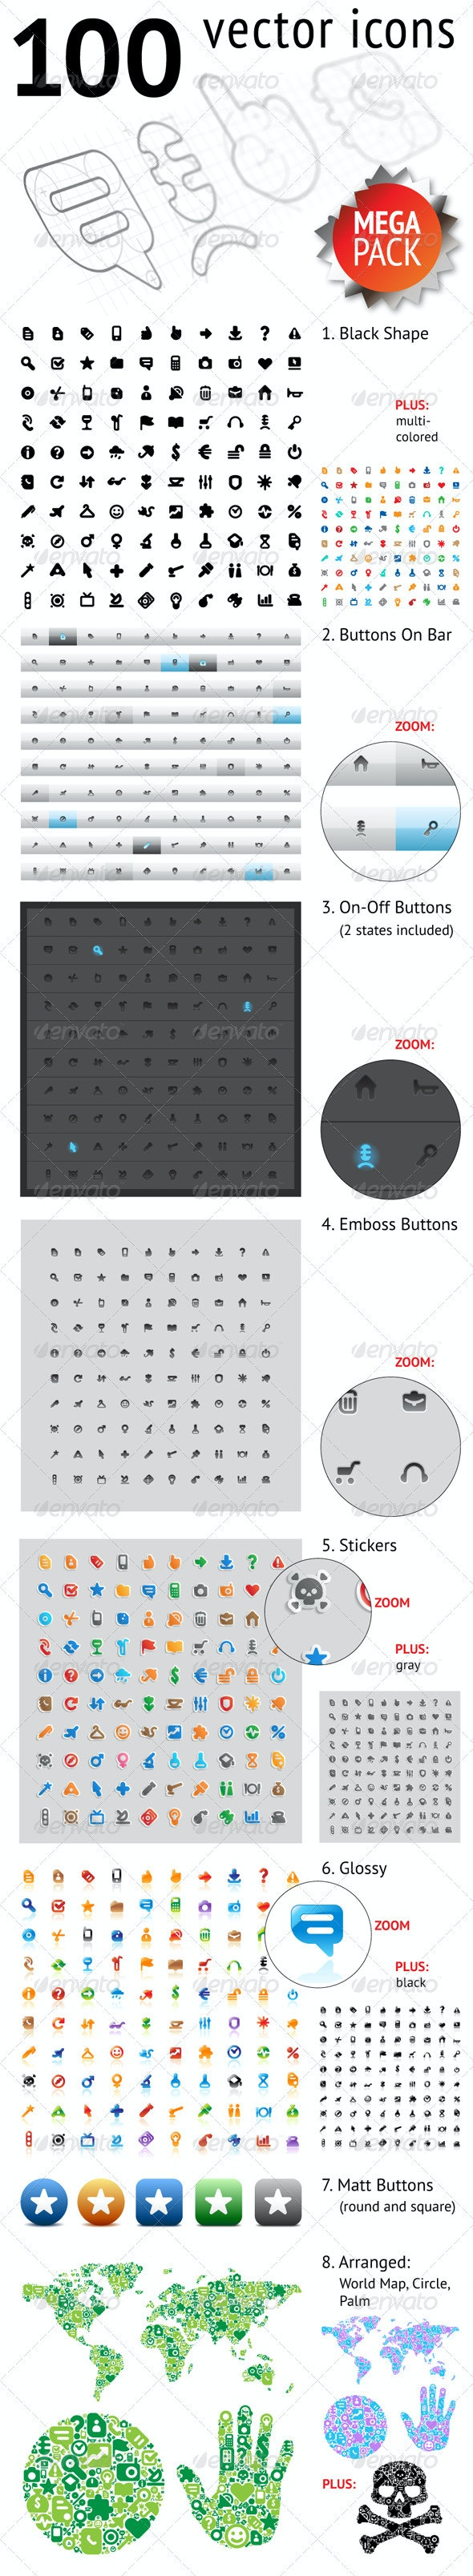 Web Icons Mega Pack - Web Icons